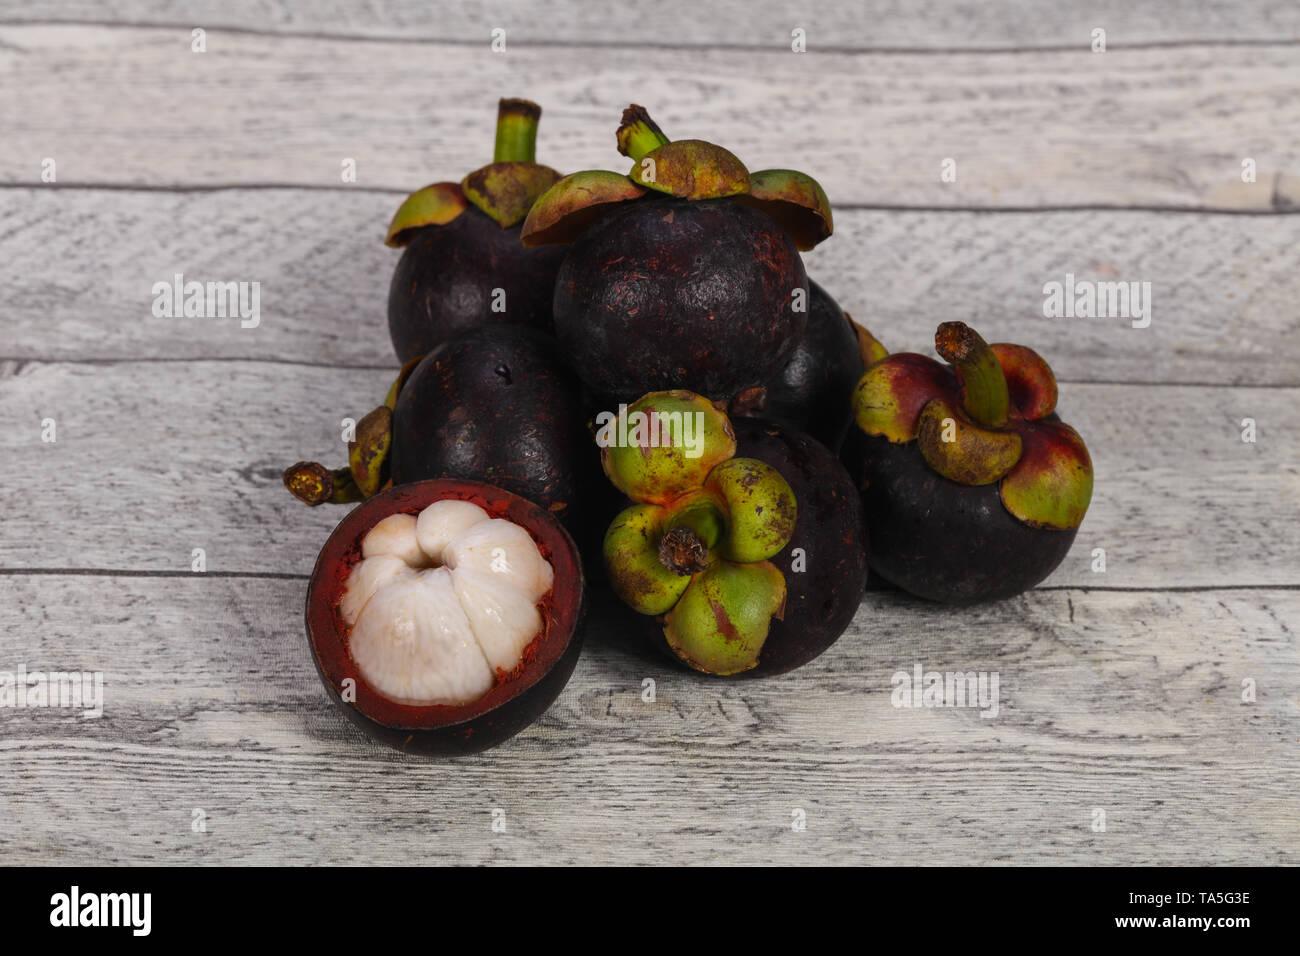 Ripe Sweet delicous exotic fruit - Mangosteen - Stock Image